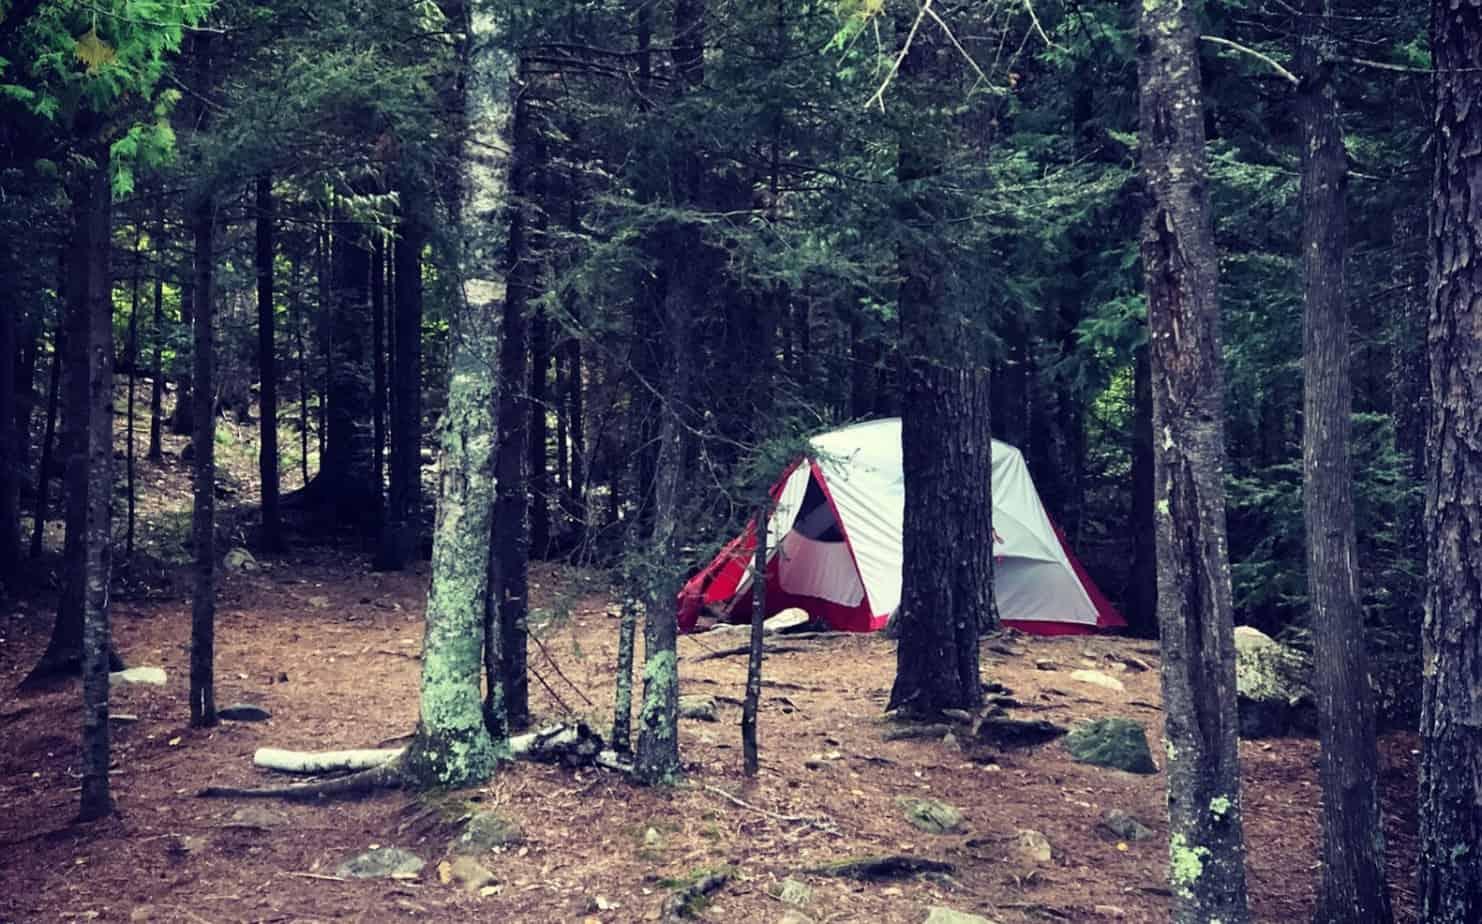 Best camping blog website bwca hilltop campers minnesota